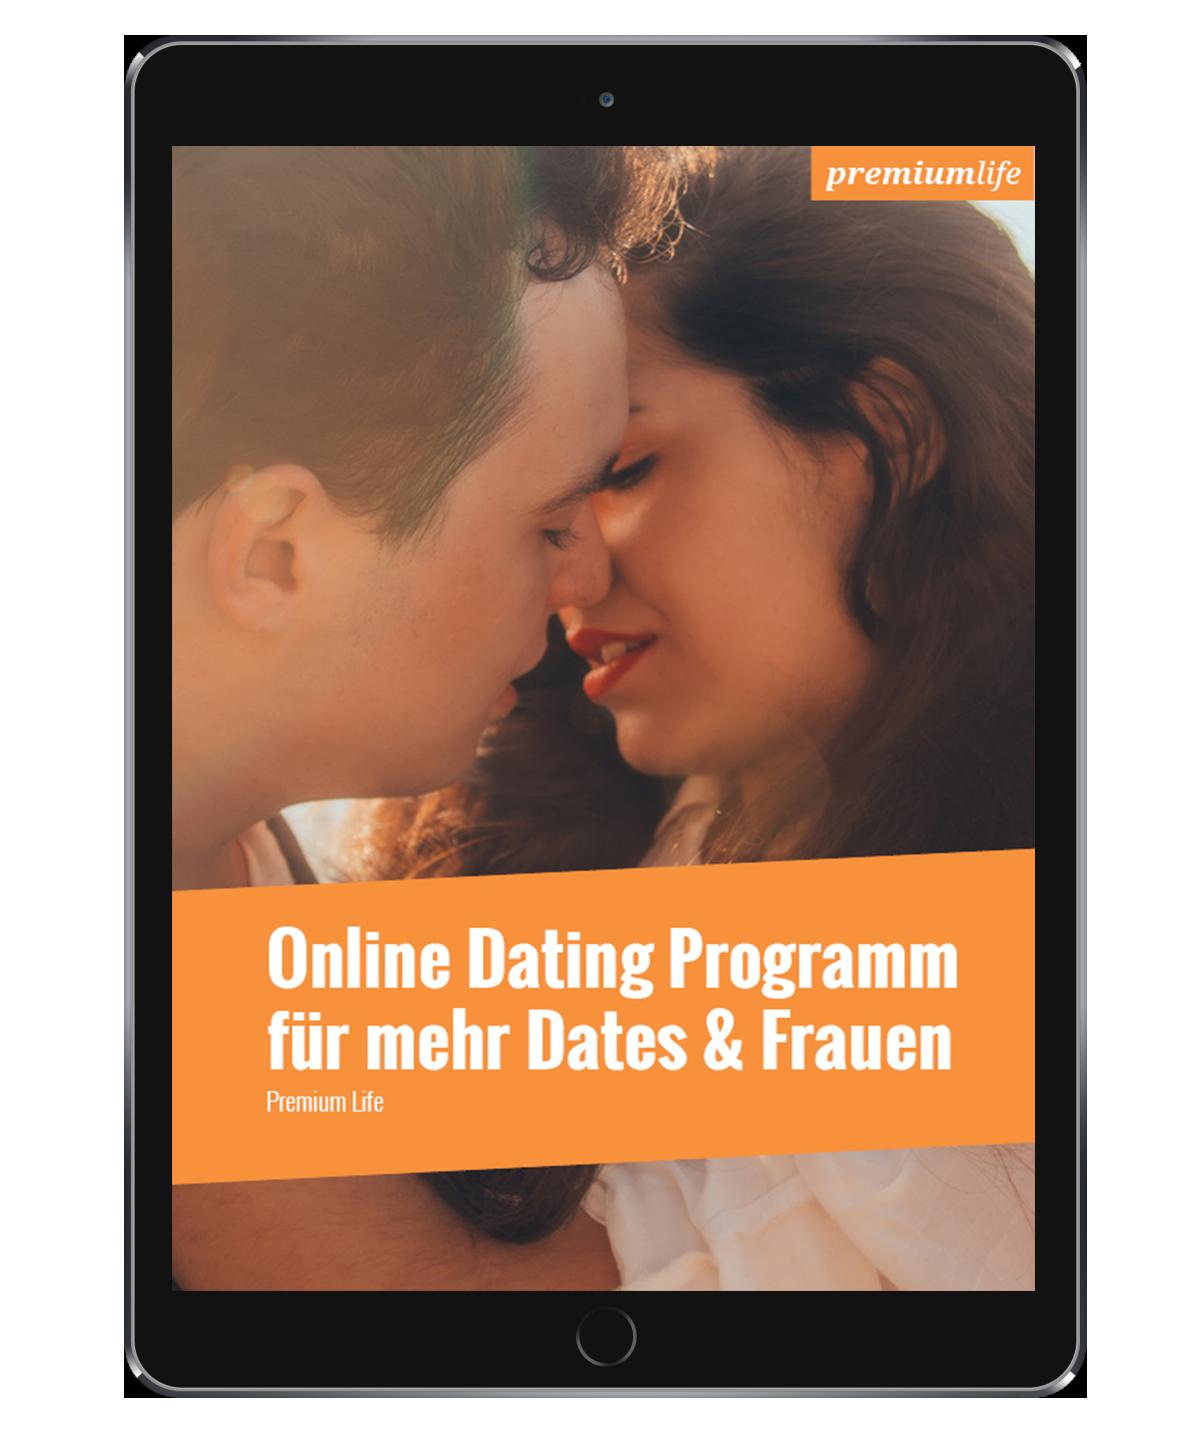 online dating gute Fragen μικρό βράχο του Αρκάνσας που χρονολογείται